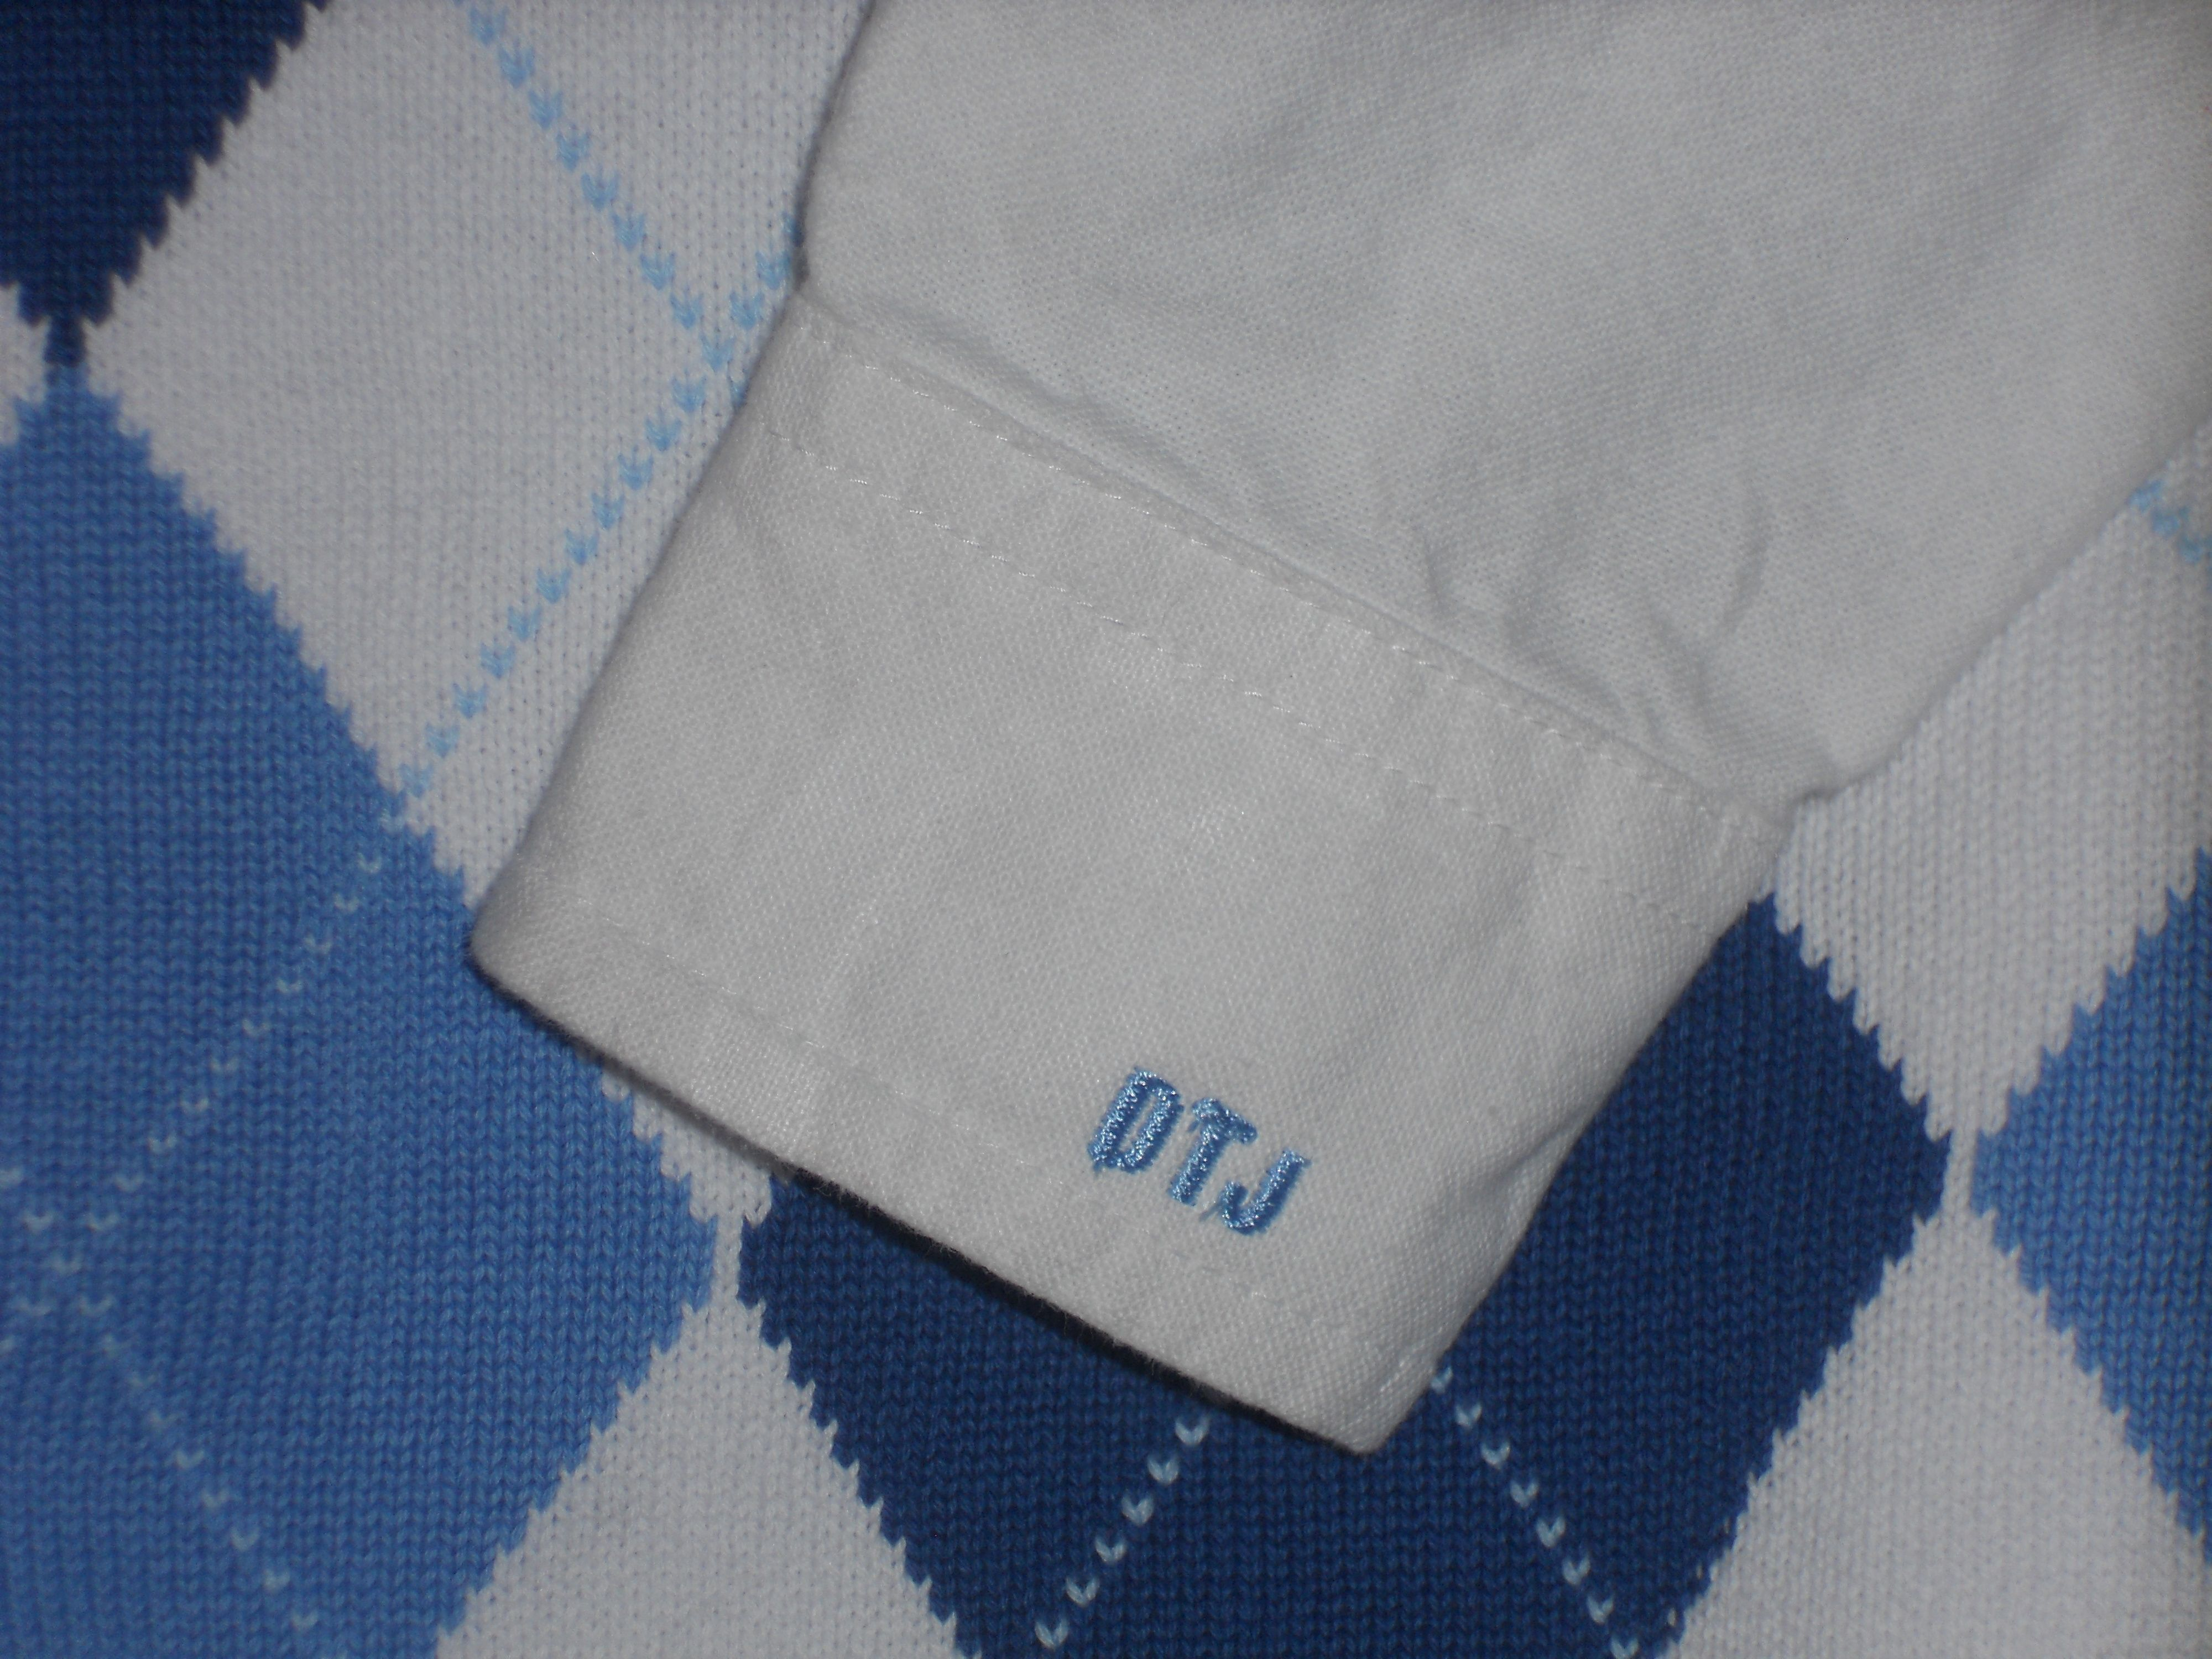 Little Boys Monogrammed Dress Shirt Cuff For Easter Monogramming